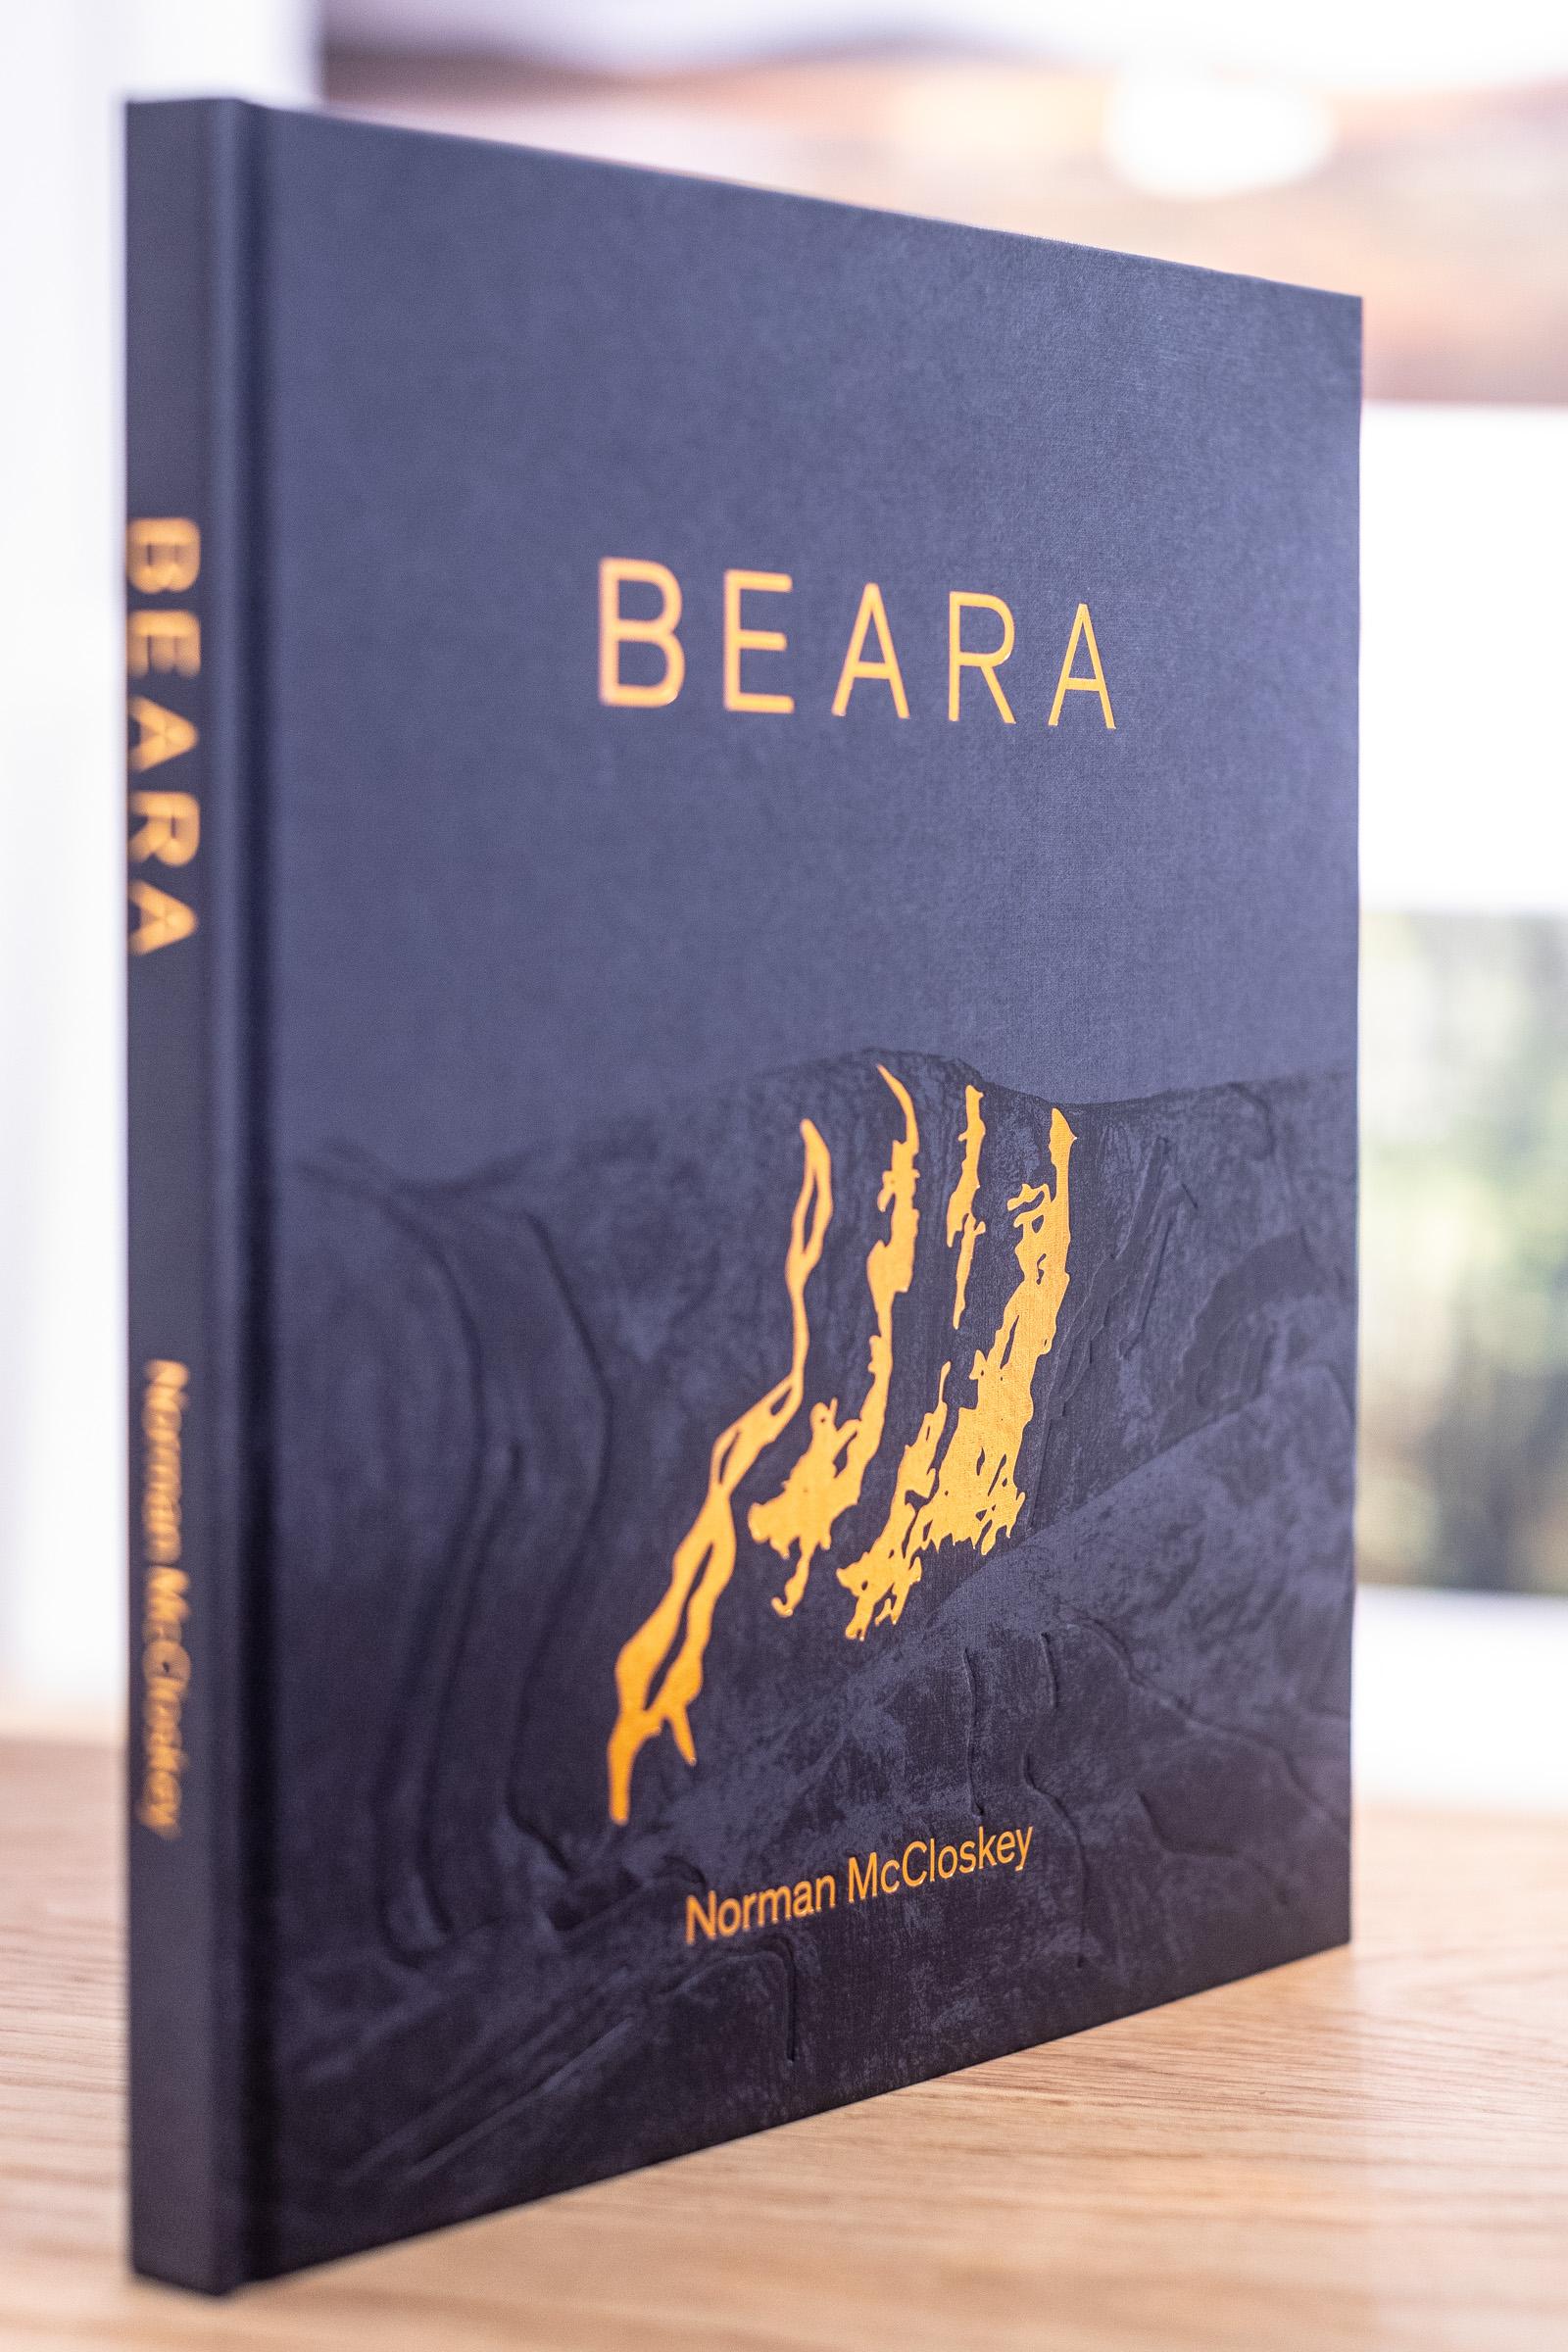 Beara Book By Norman McCloskey